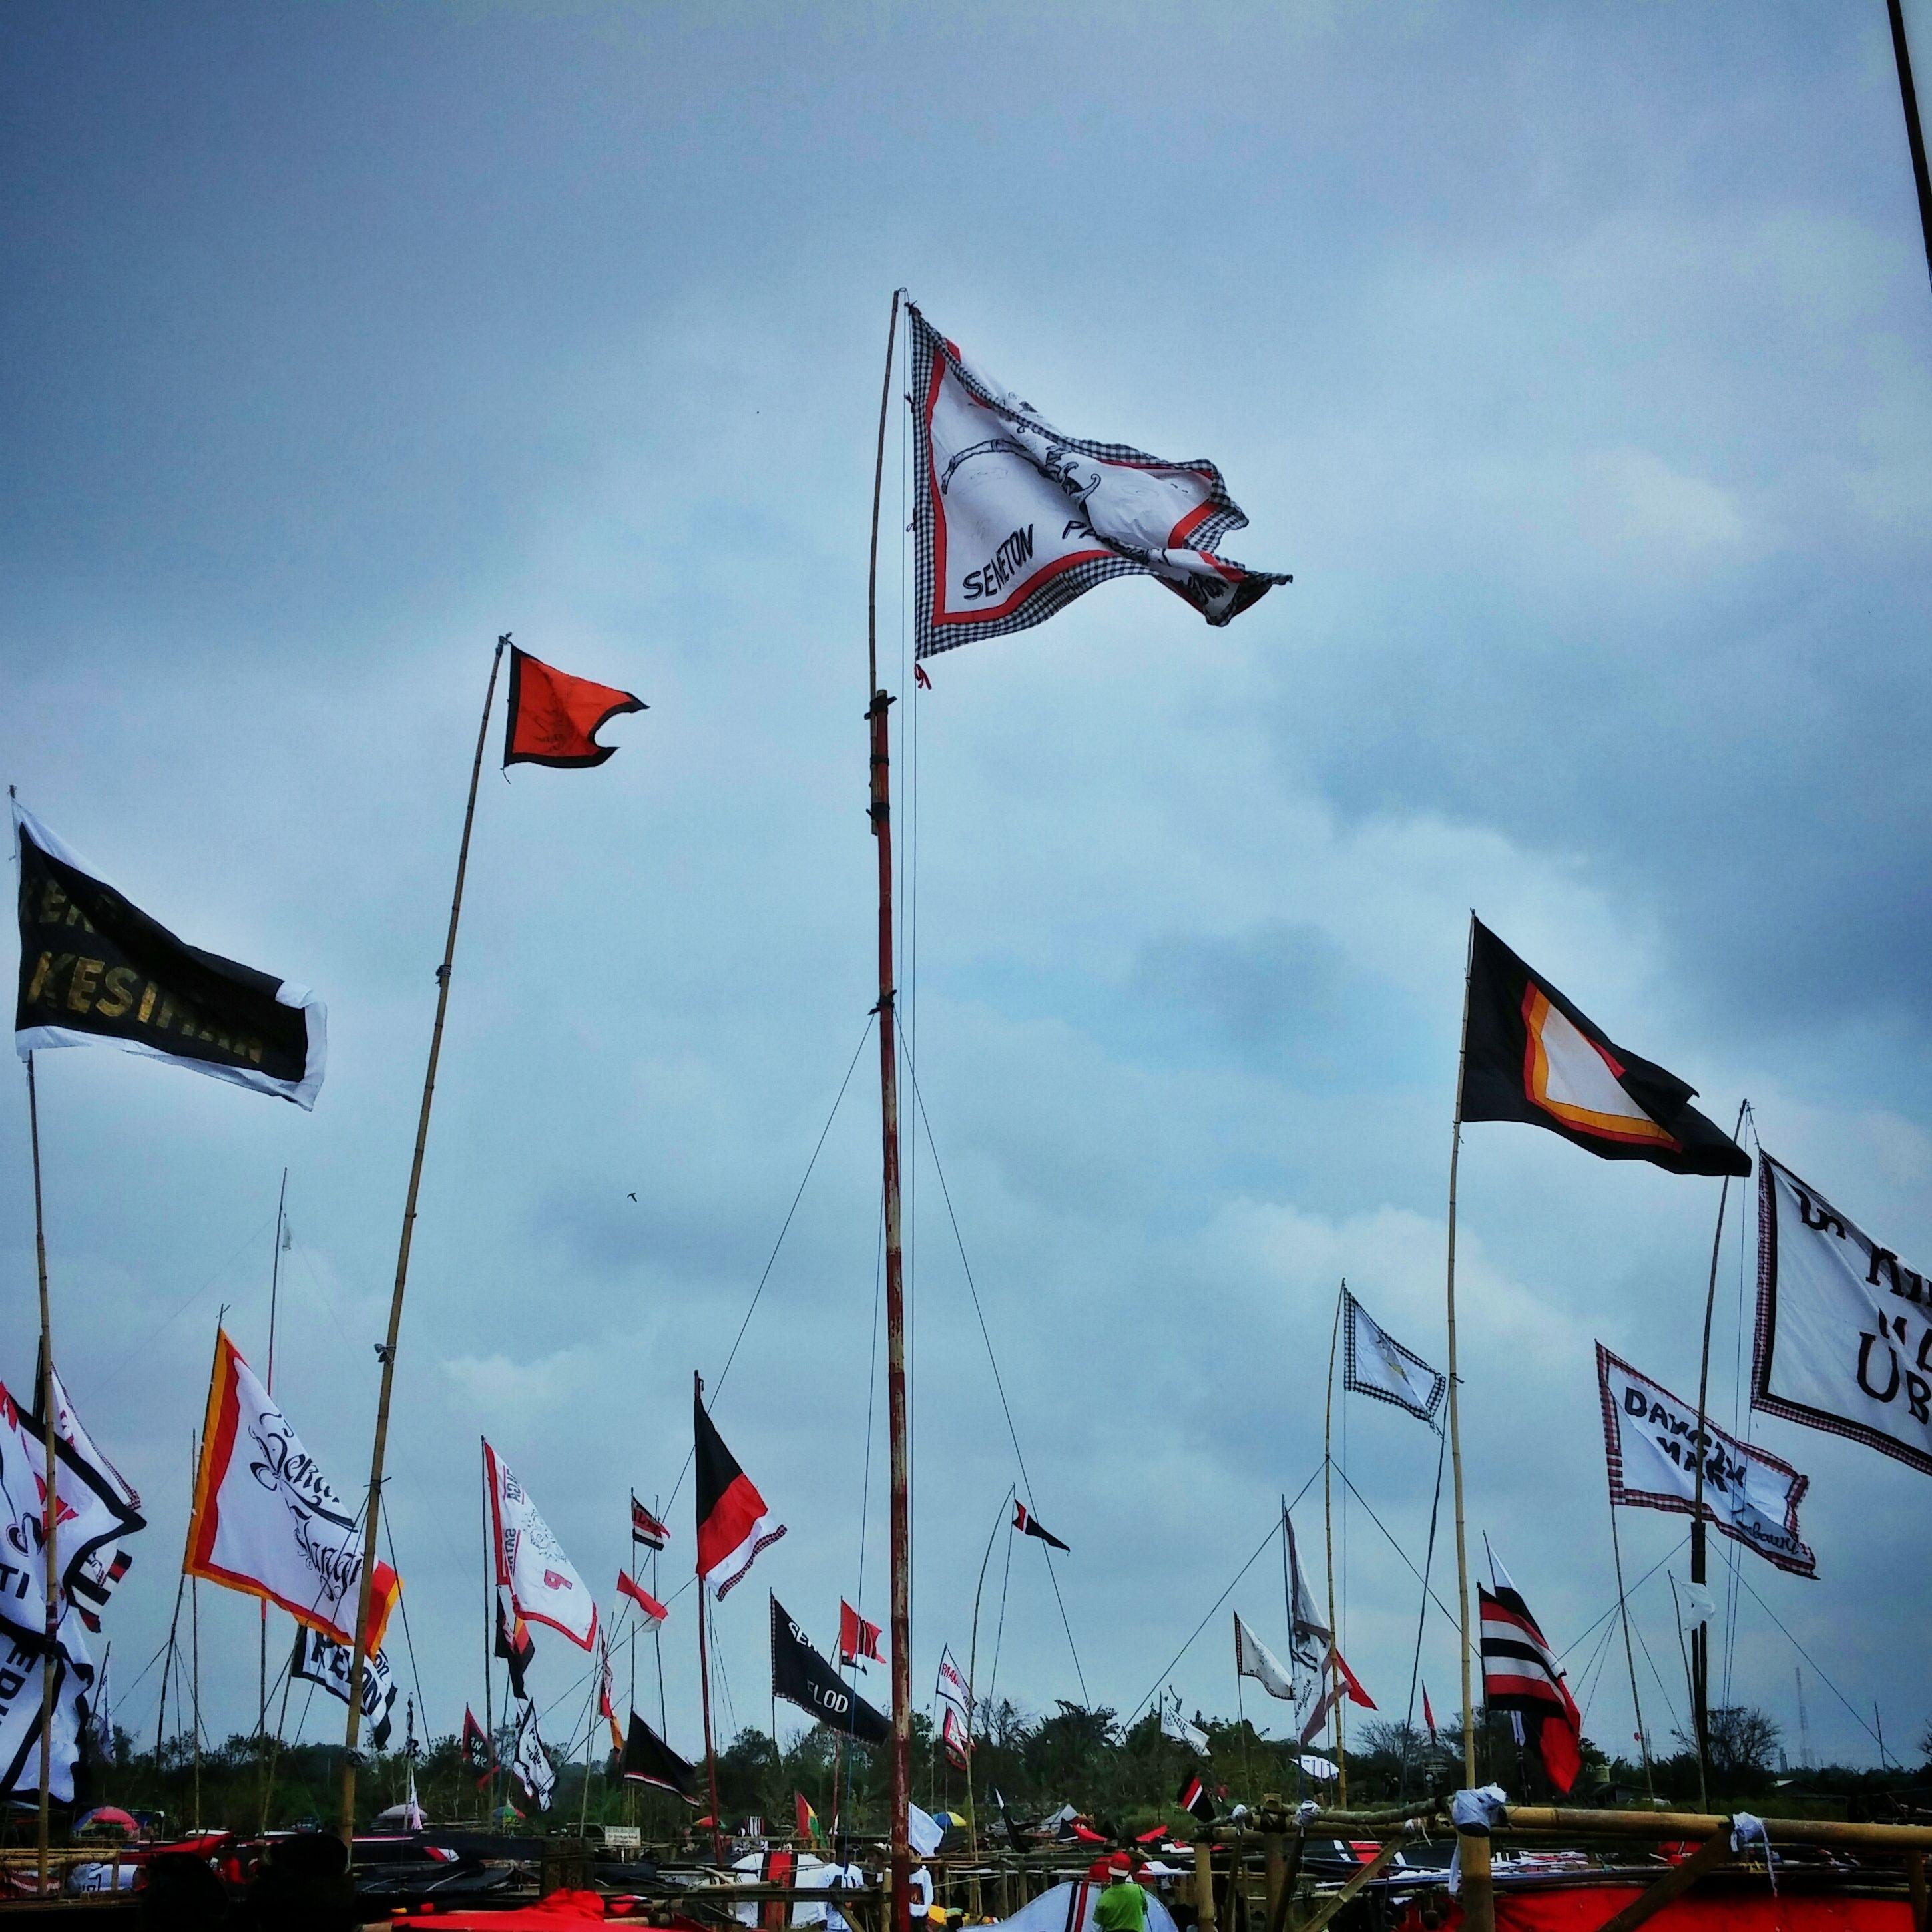 Banjar's flag